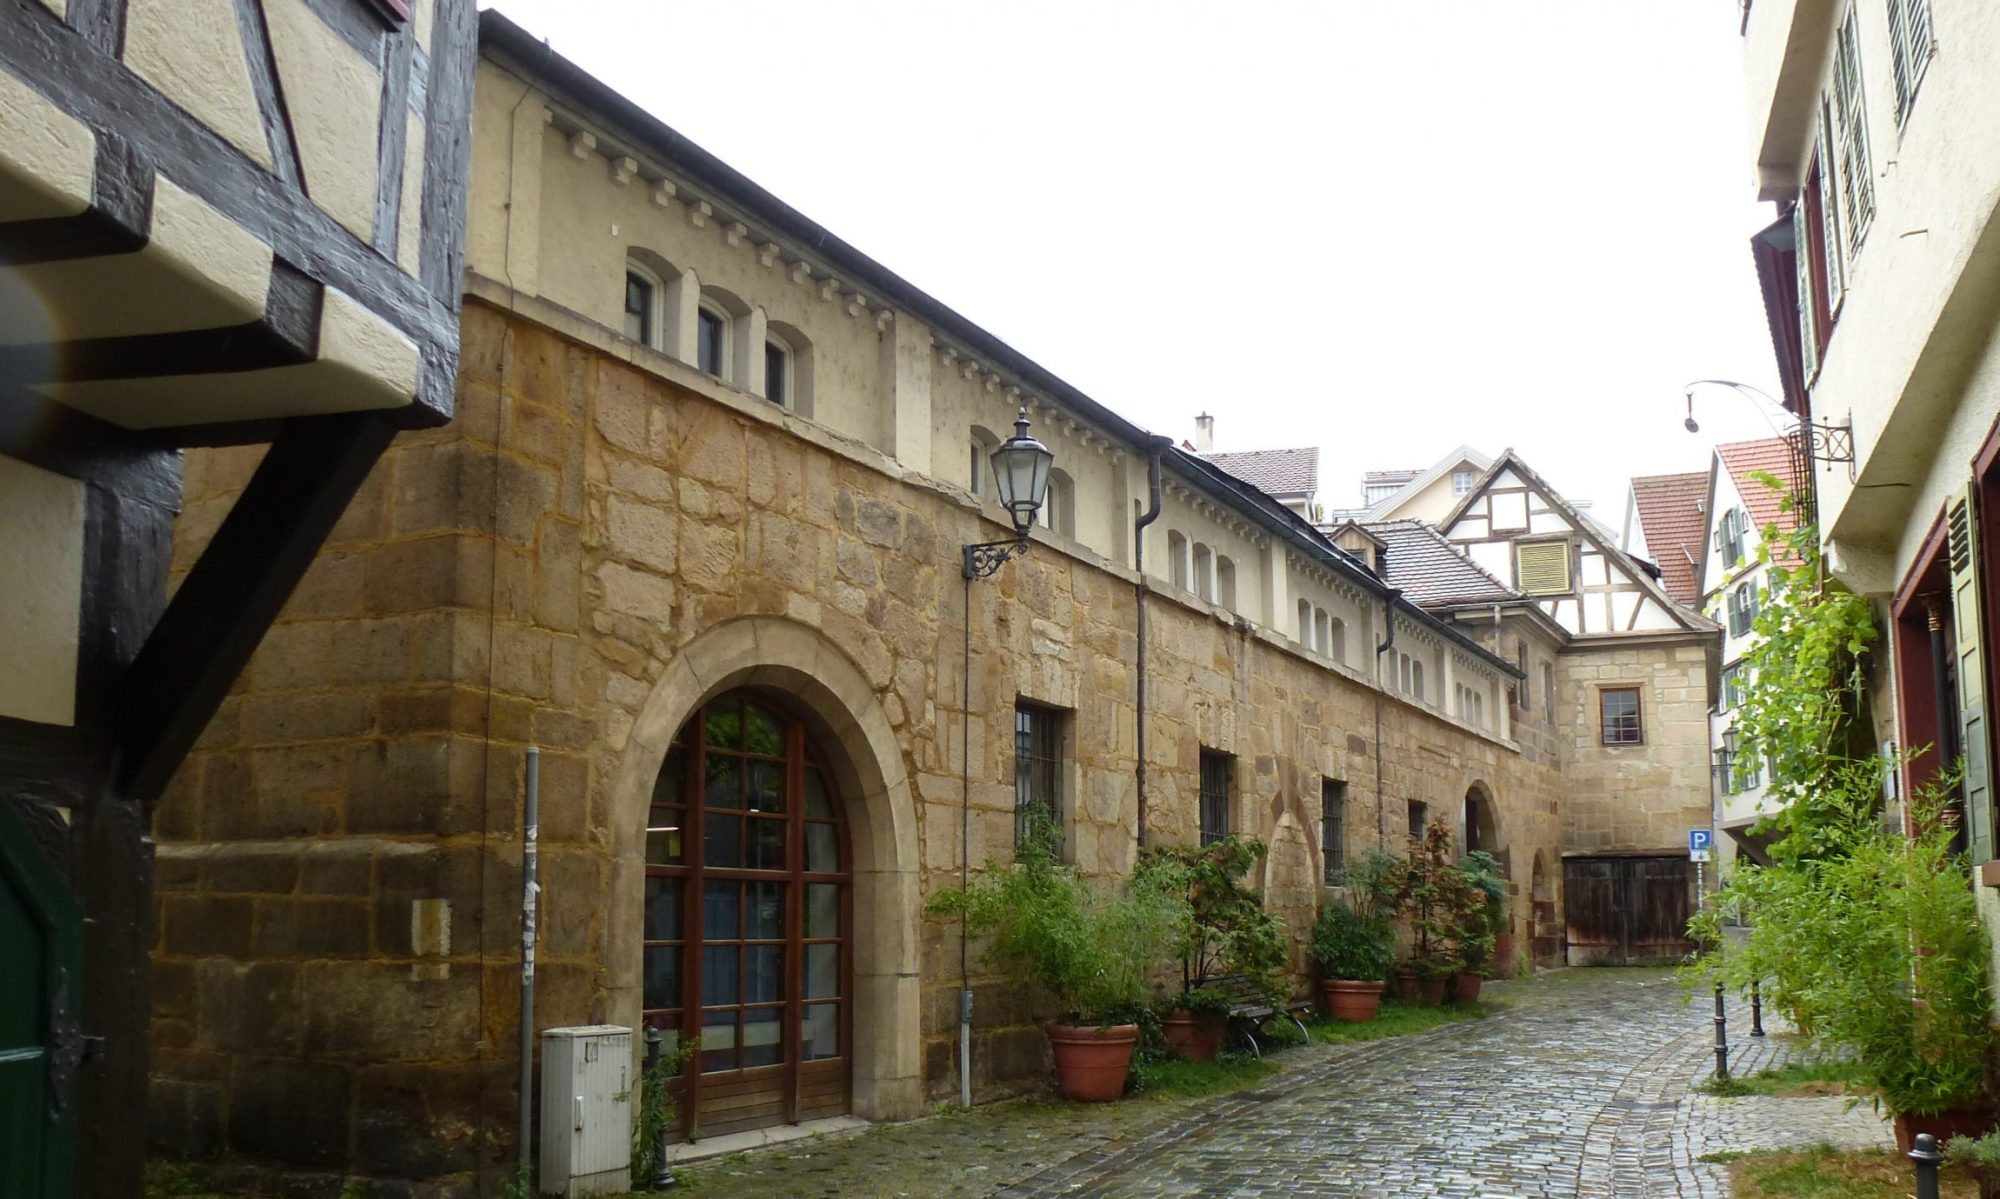 Förderverein Stadtbücherei Esslingen